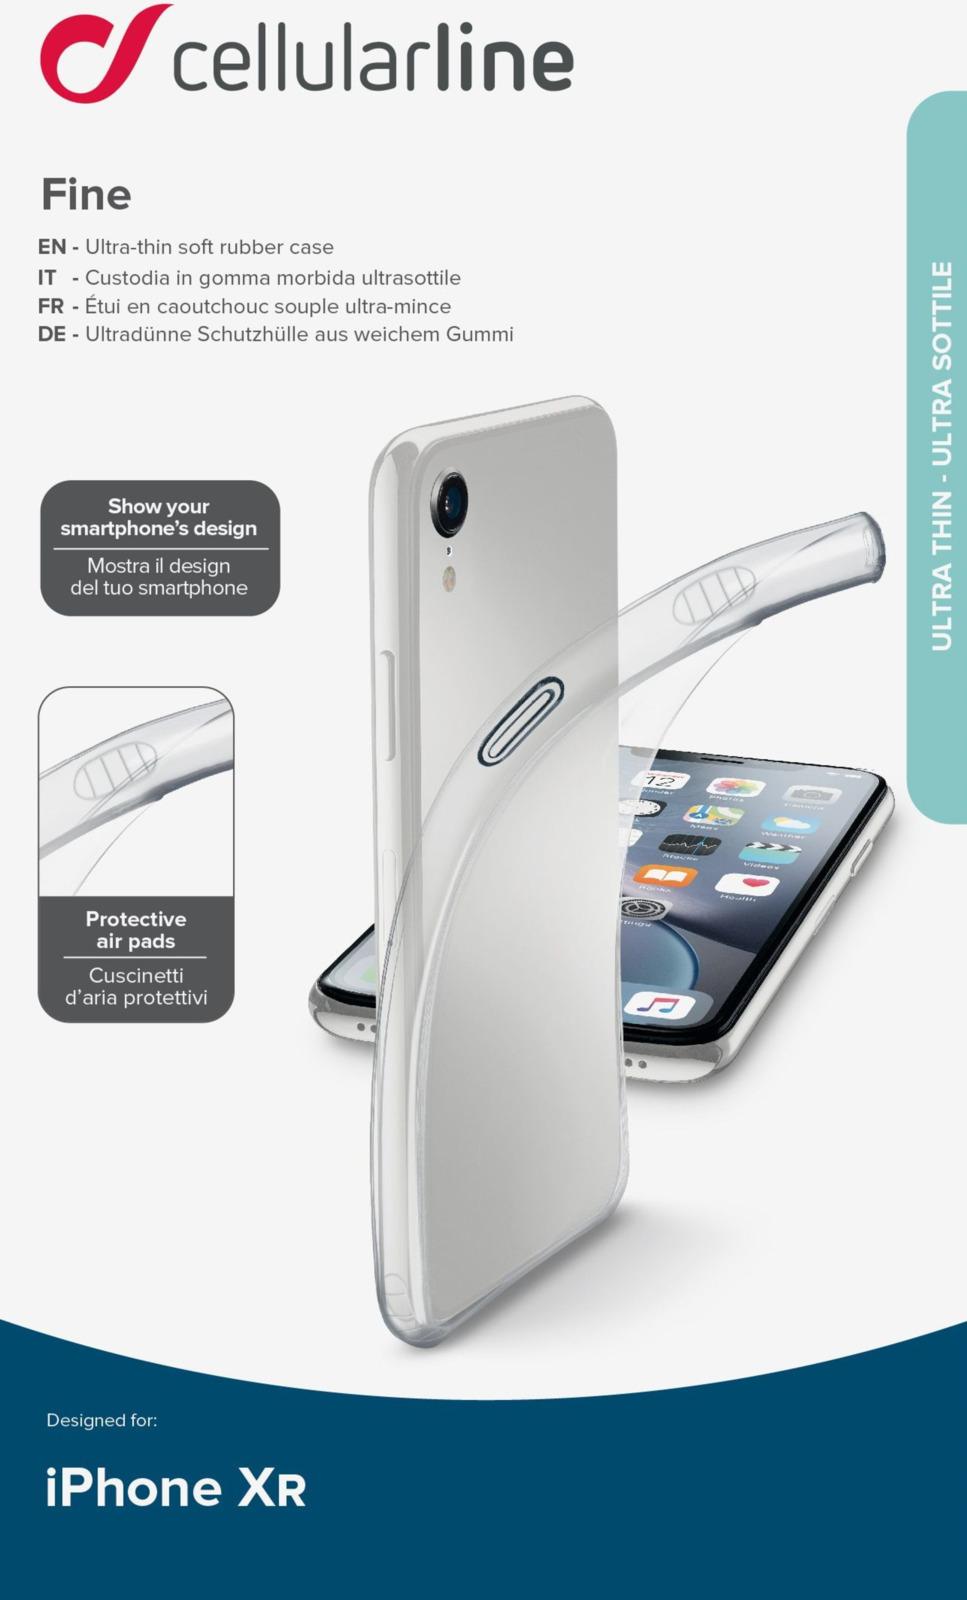 Фото - Чехол Cellularline для Apple iPhone XR, FINECIPH961T, прозрачный чехол для iphone xs max cellularline clear duo прозрачный